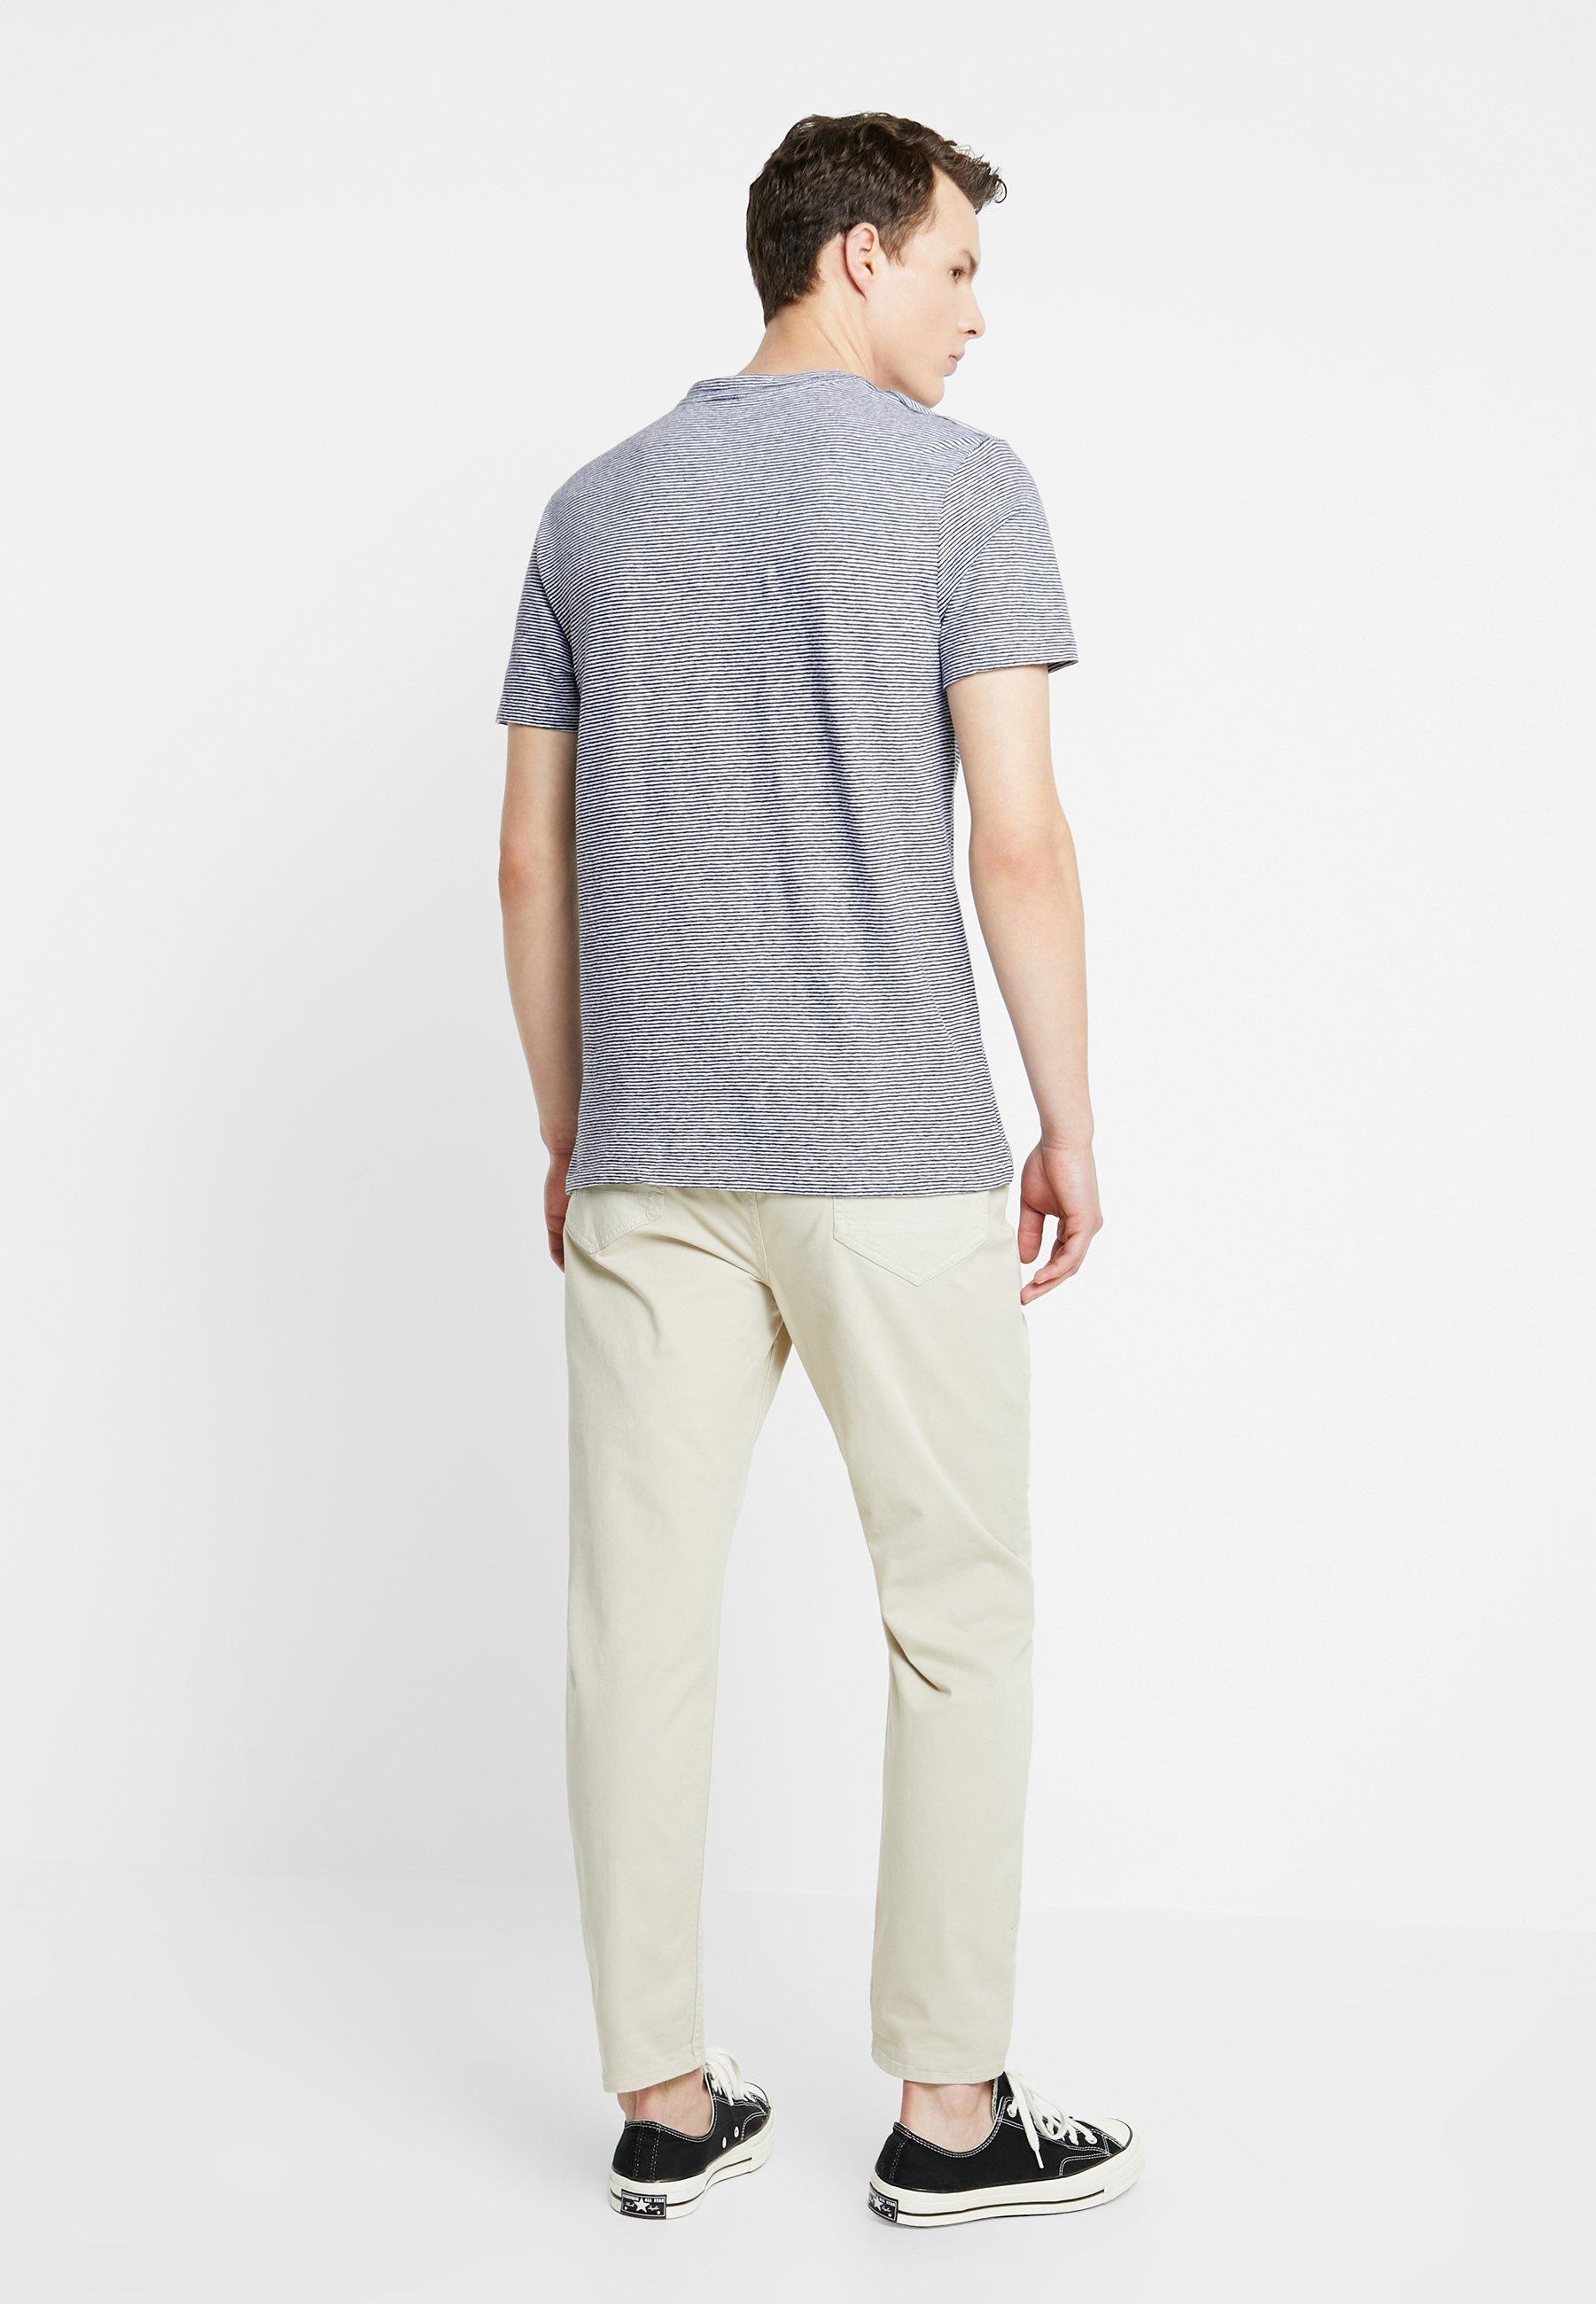 White blue CrewT shirt Tonic Basique Allsaints Lupa 3RqAjL54